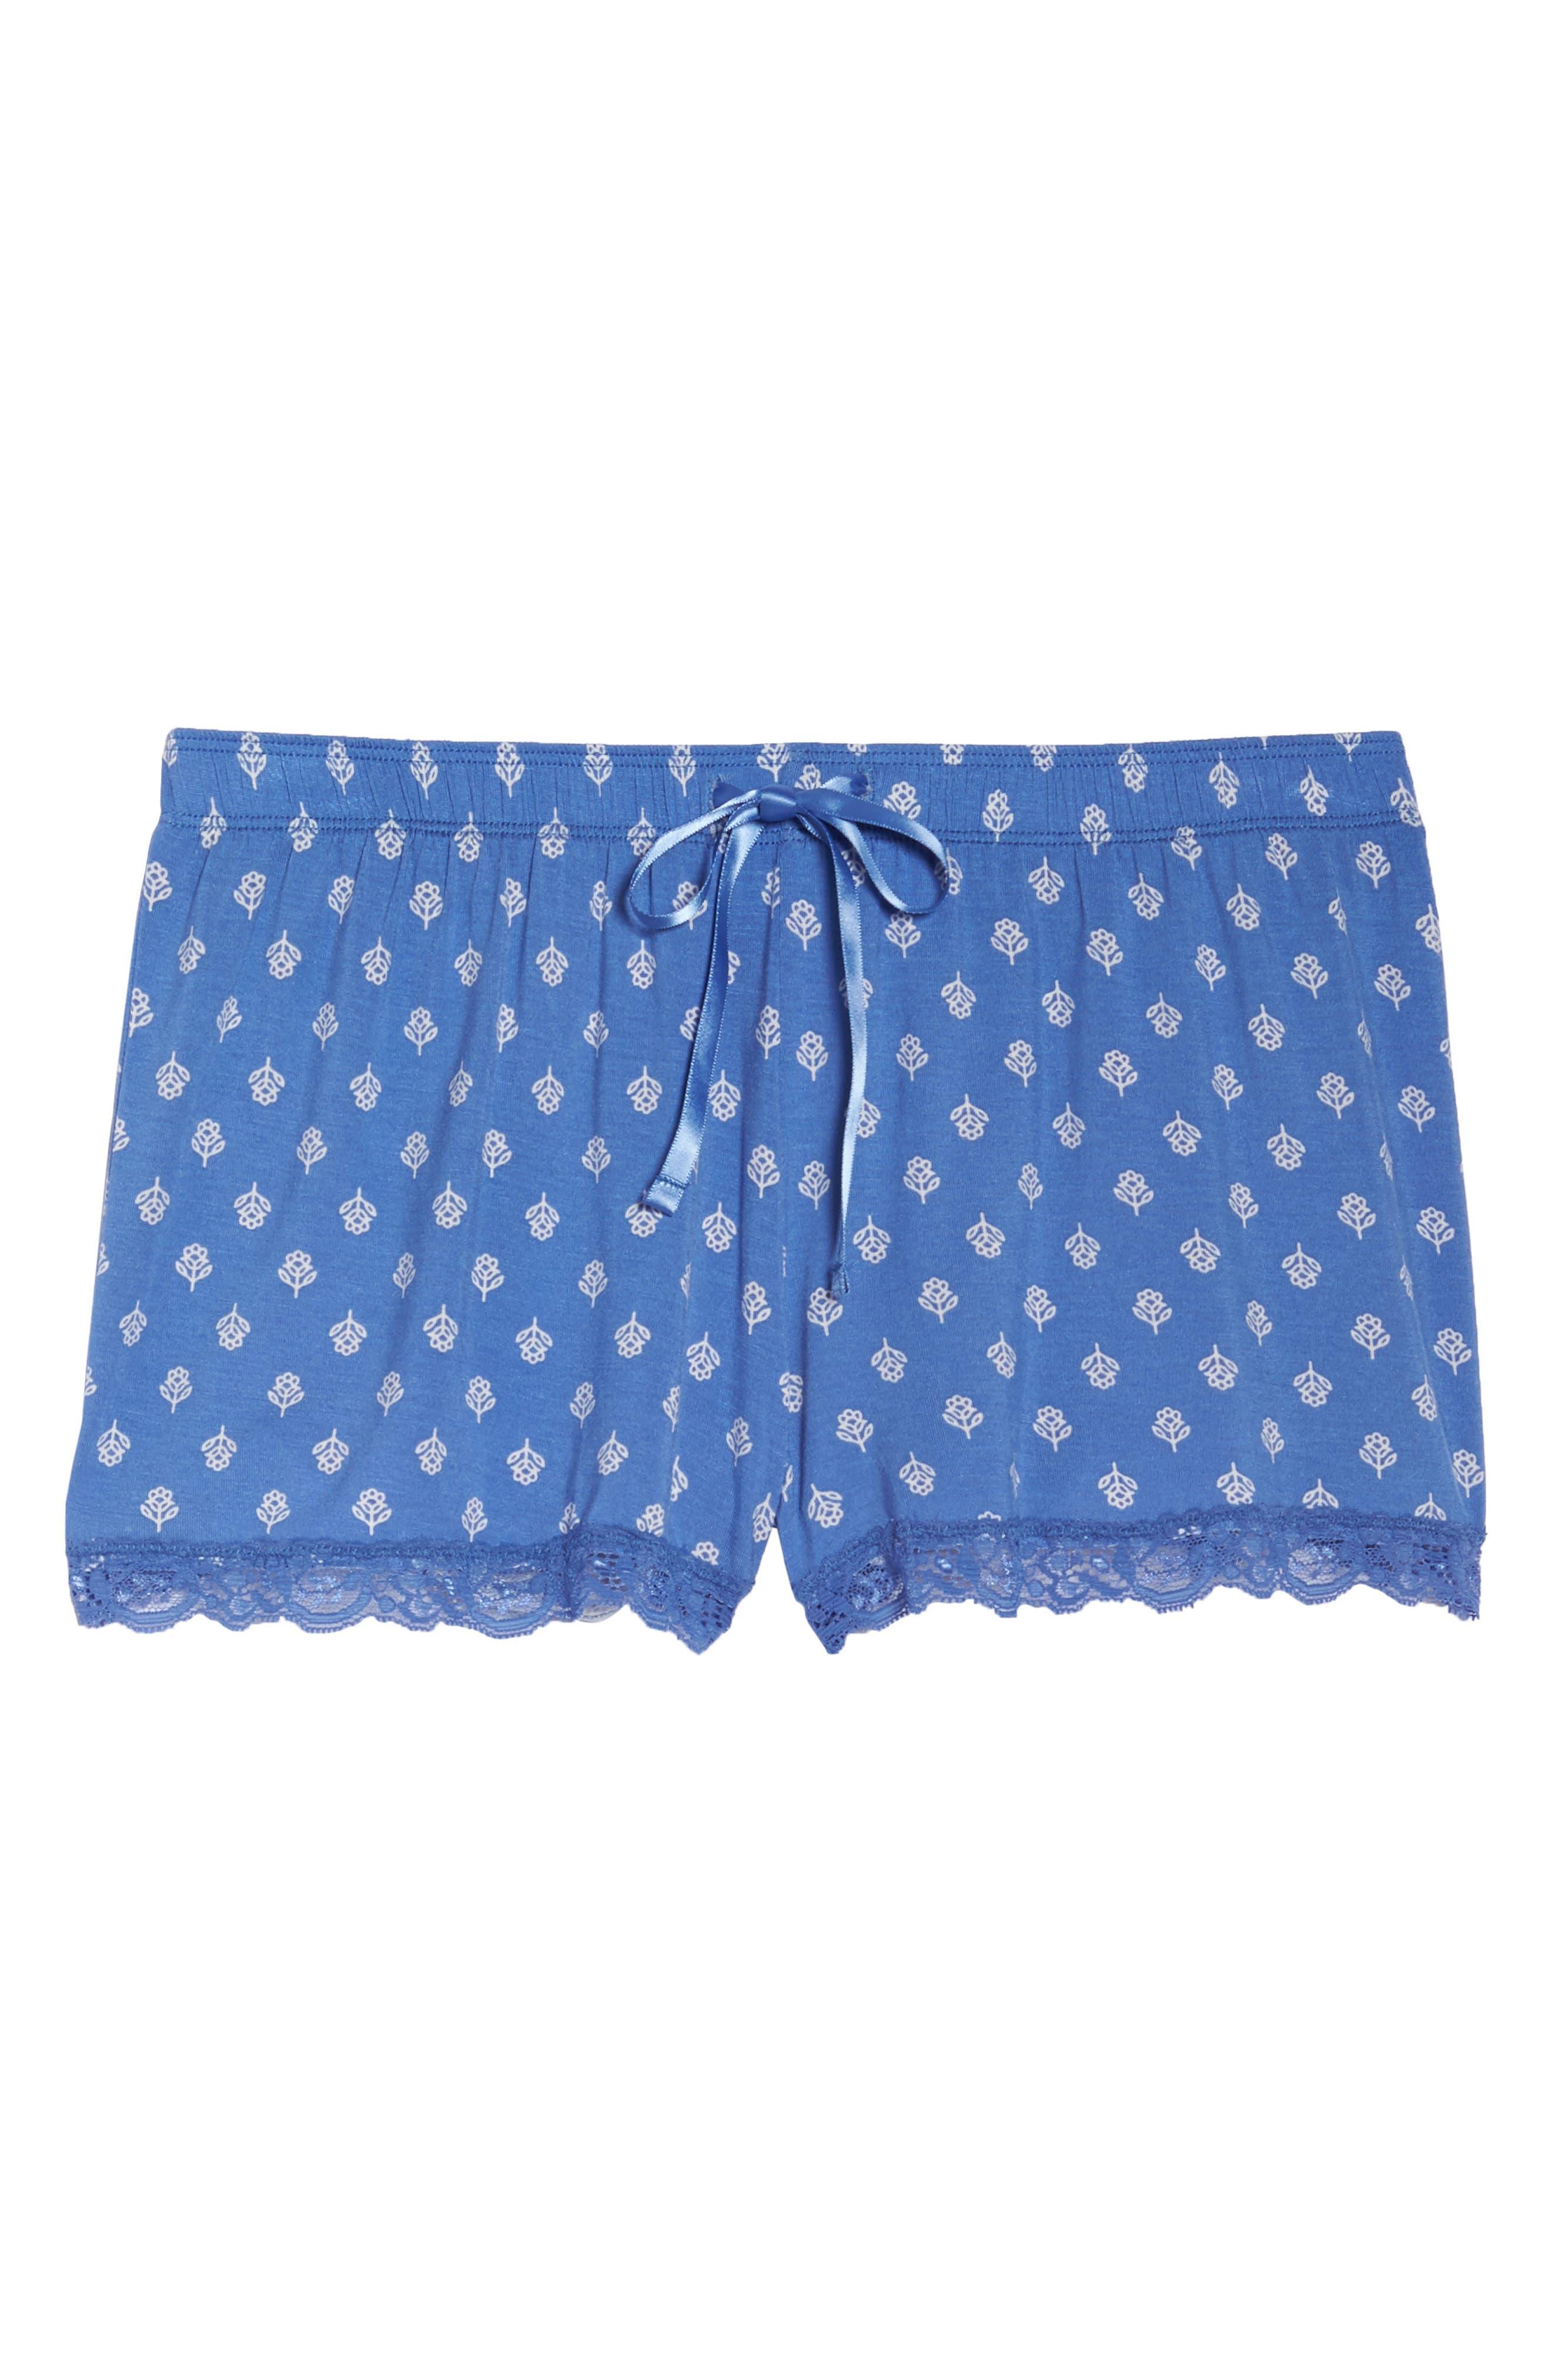 Pajama Shorts,                             Alternate thumbnail 5, color,                             Blue